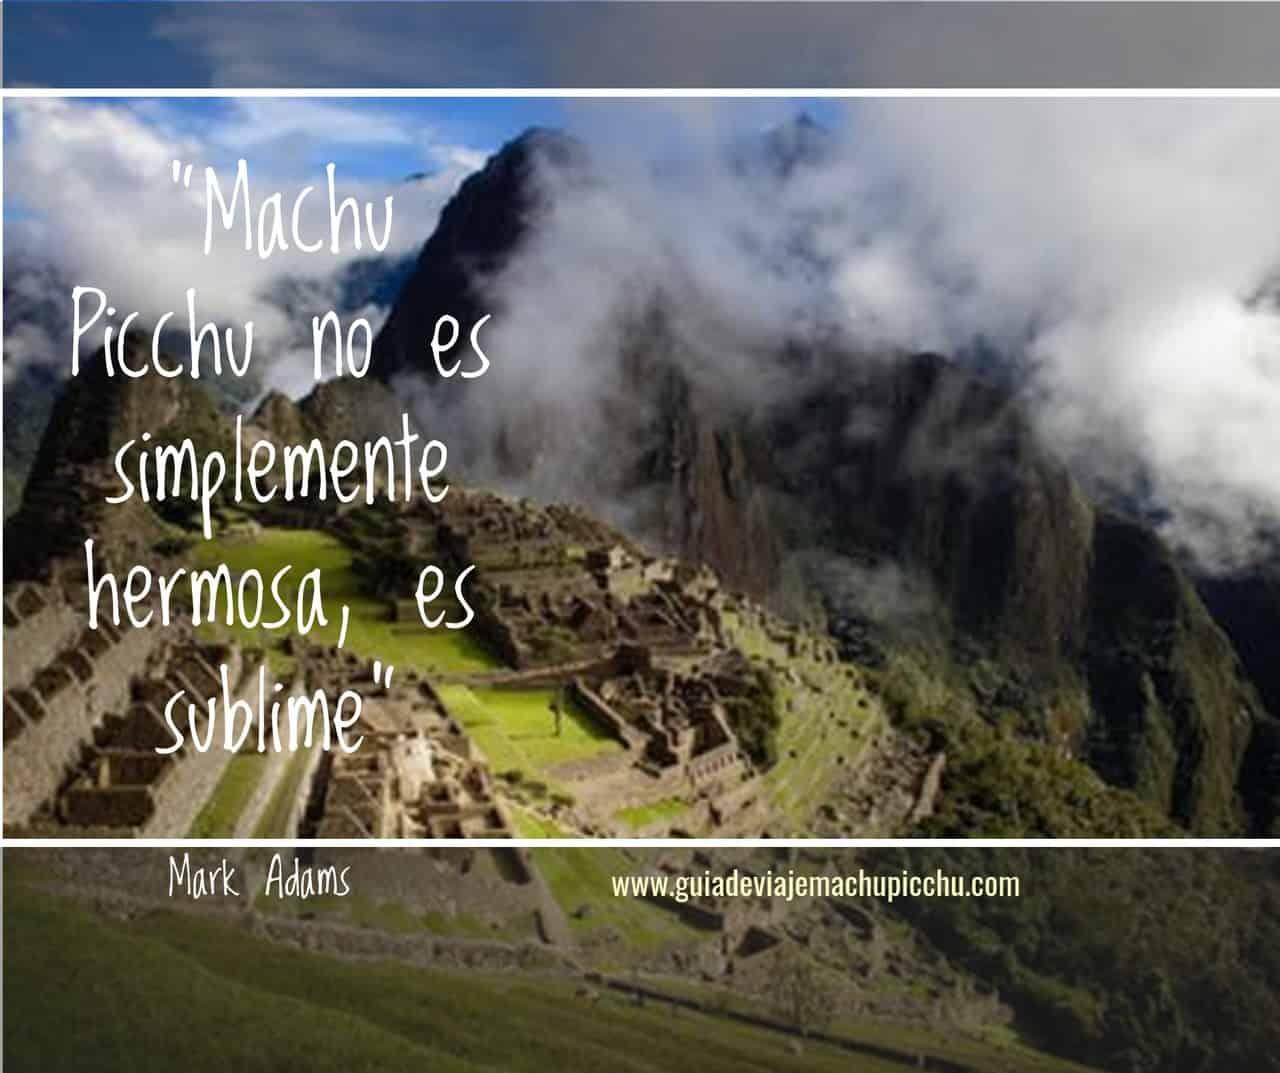 Machu Picchu quotes